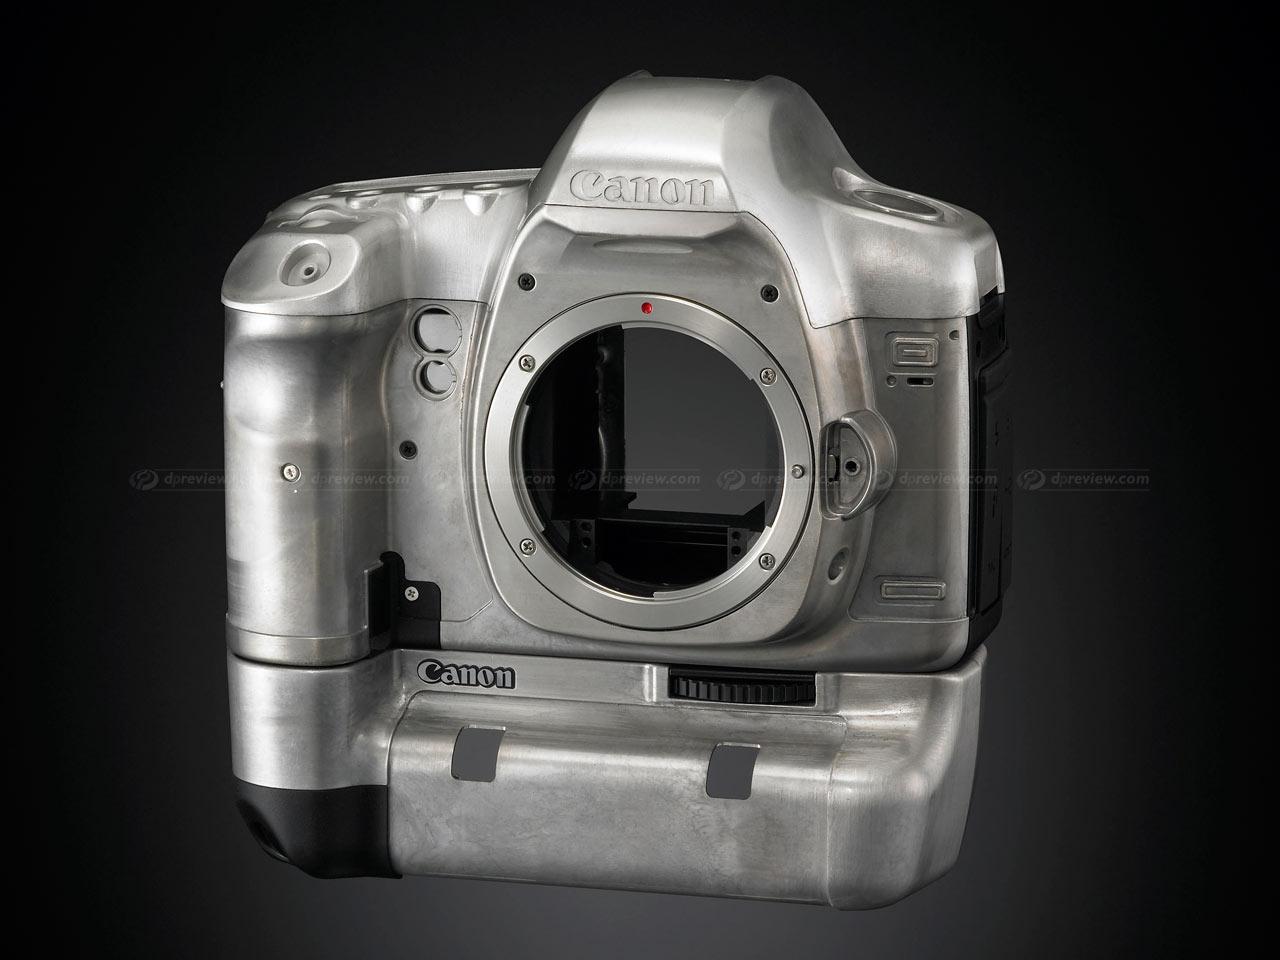 Canon Eos 5d Mark Ii 21mp And Hd Movies Digital Photography Review Tutup Body Lensa Camera Nikon Dslr